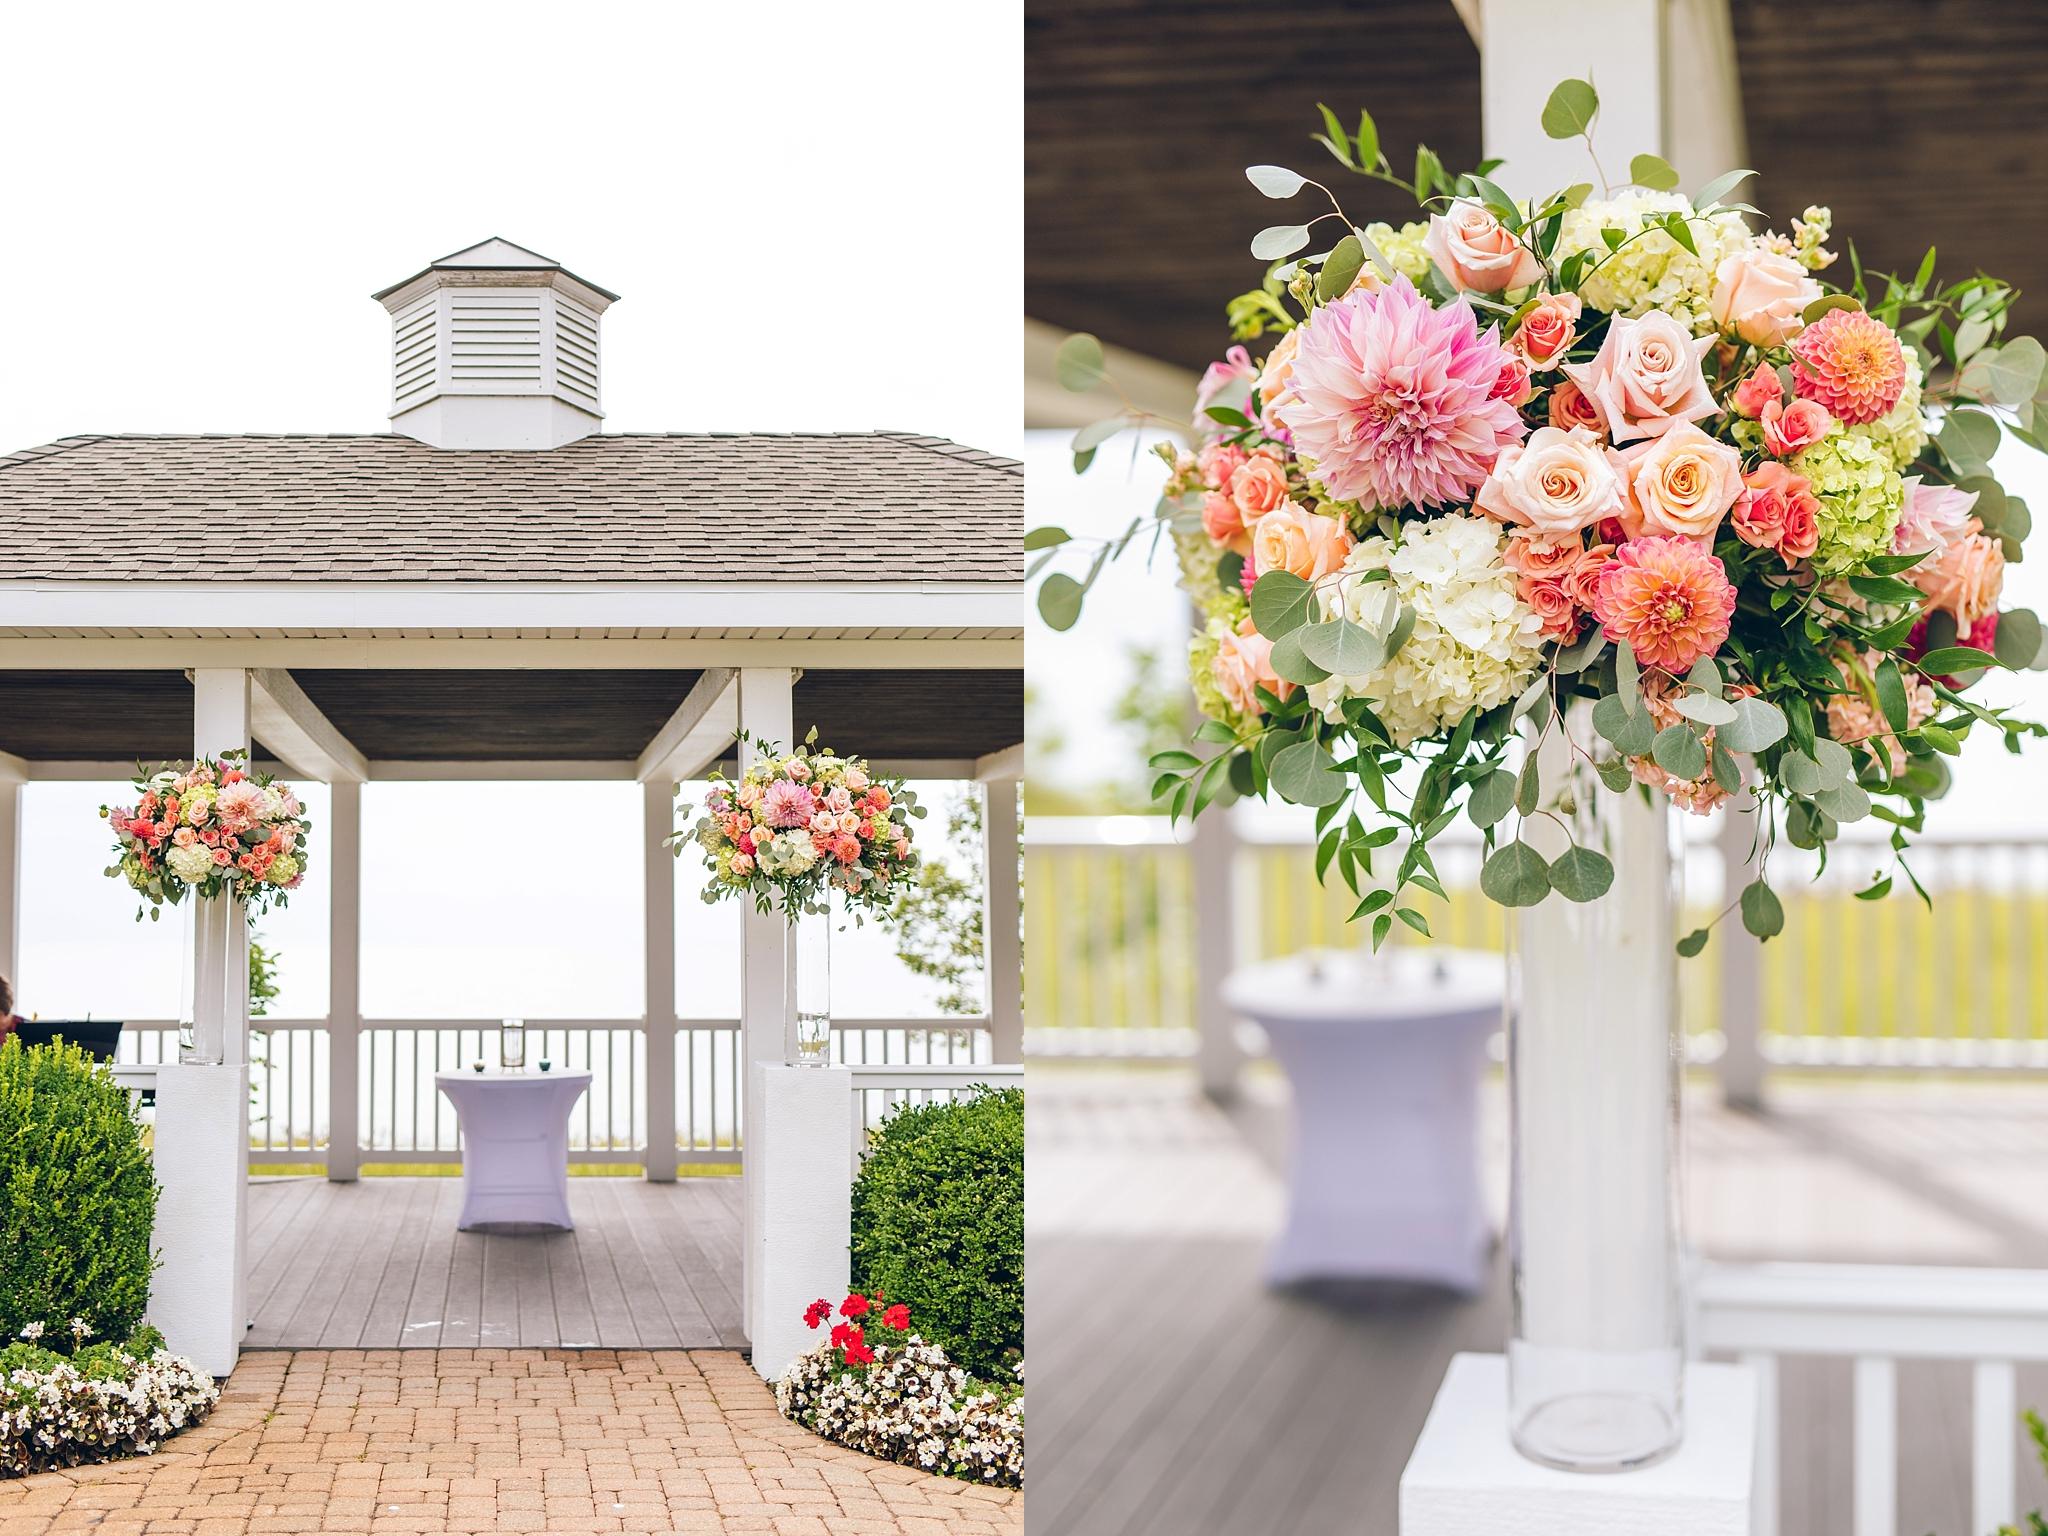 baker-lofts-holland-michigan-wedding-photographer_0348.jpg